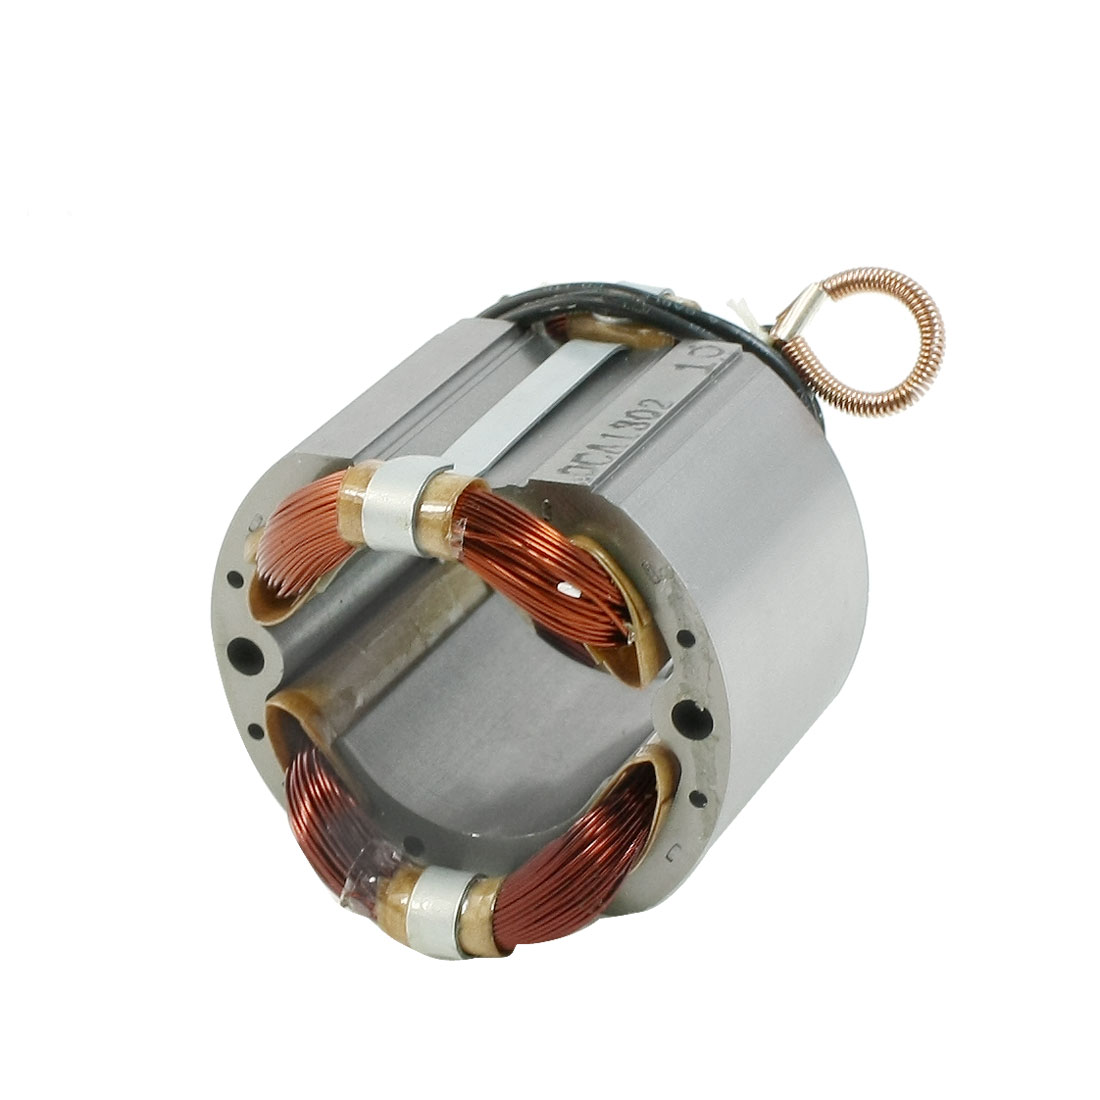 AC220V Copper 41mm Rotor Core Motor Stator for Hitachi PR-38 Electric Hammer